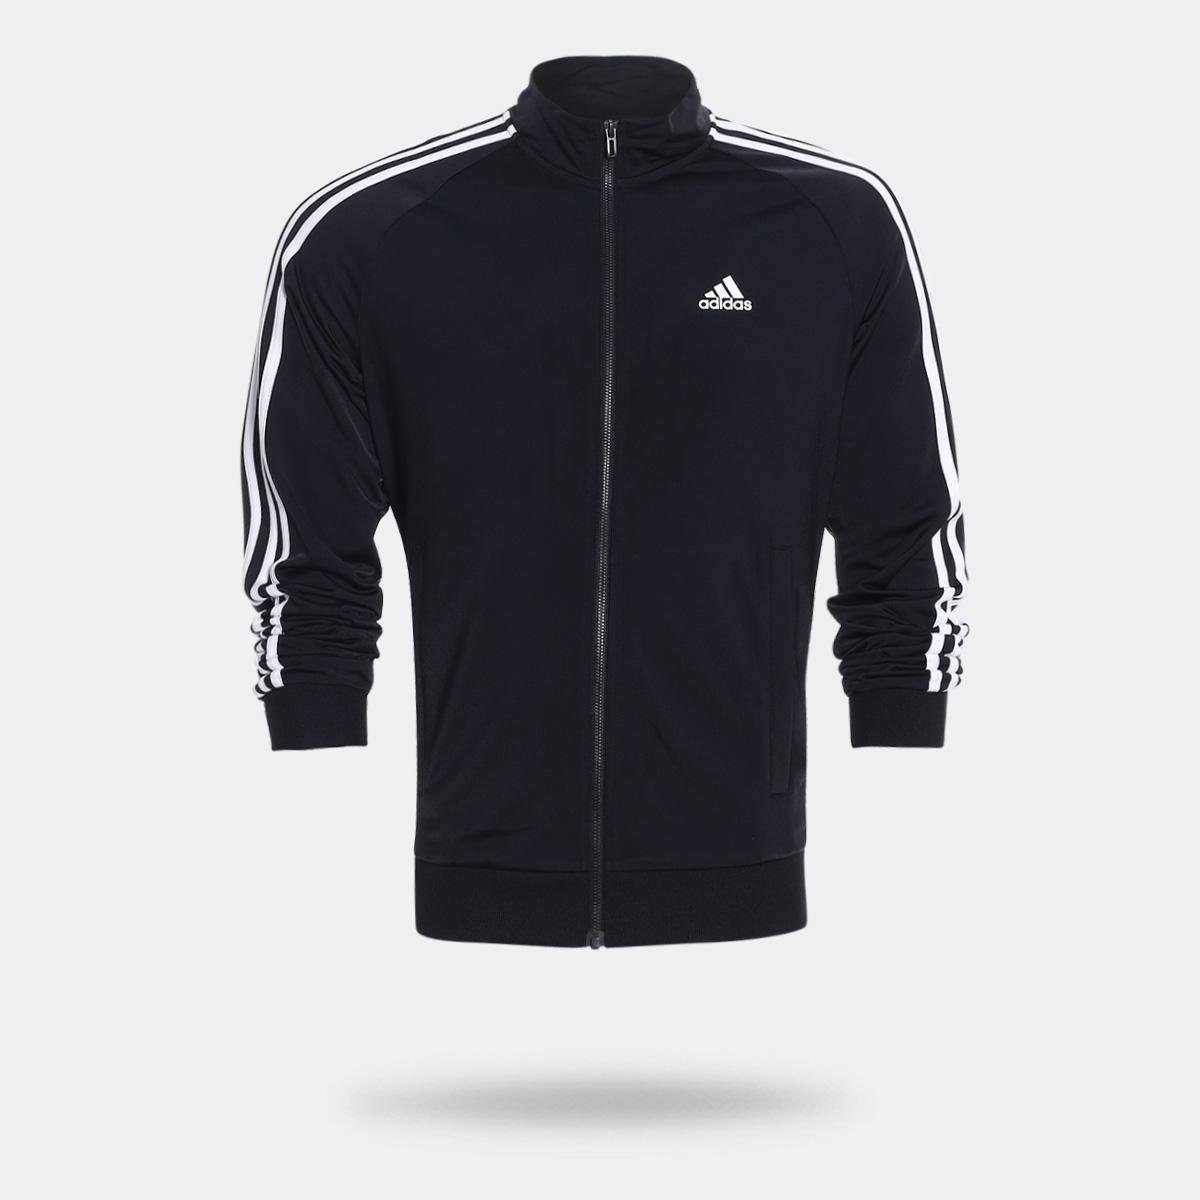 65f02102c22 Jaqueta Adidas Ess 3S Ttop Tri Masculina - Preto e Branco - Compre Agora